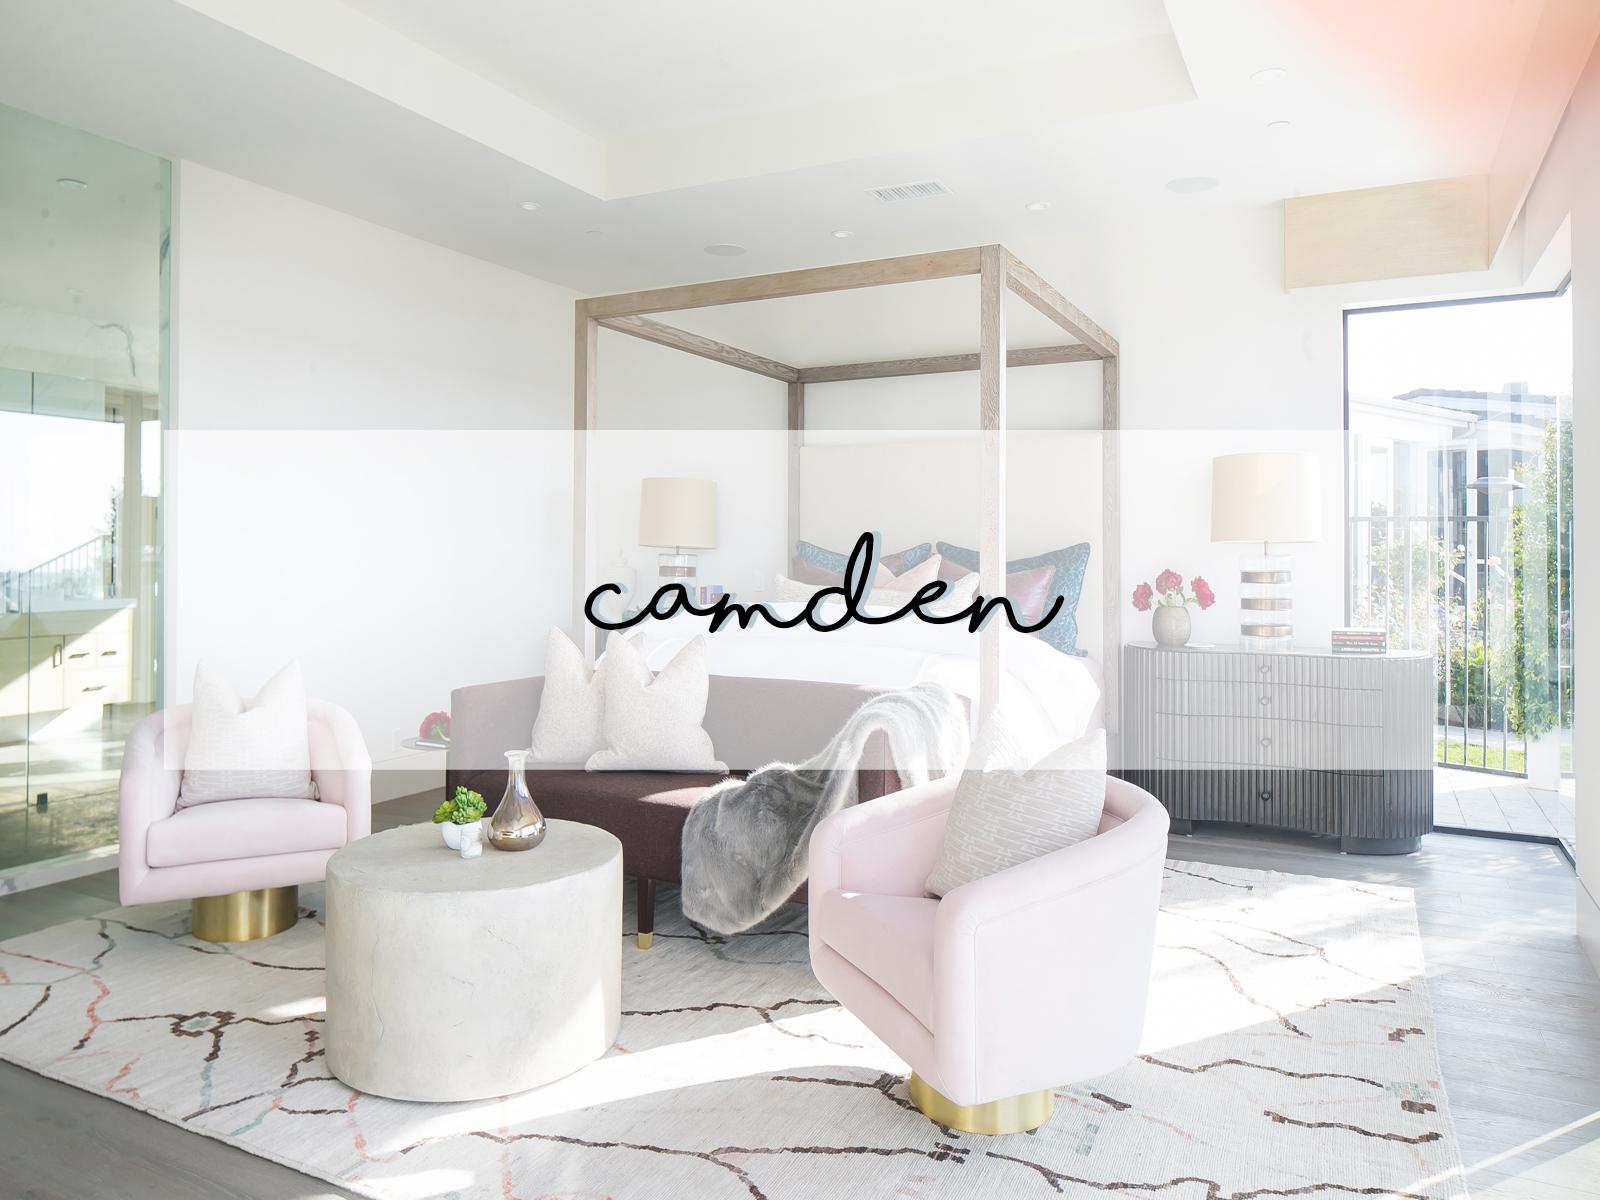 blackband_design_project_camden